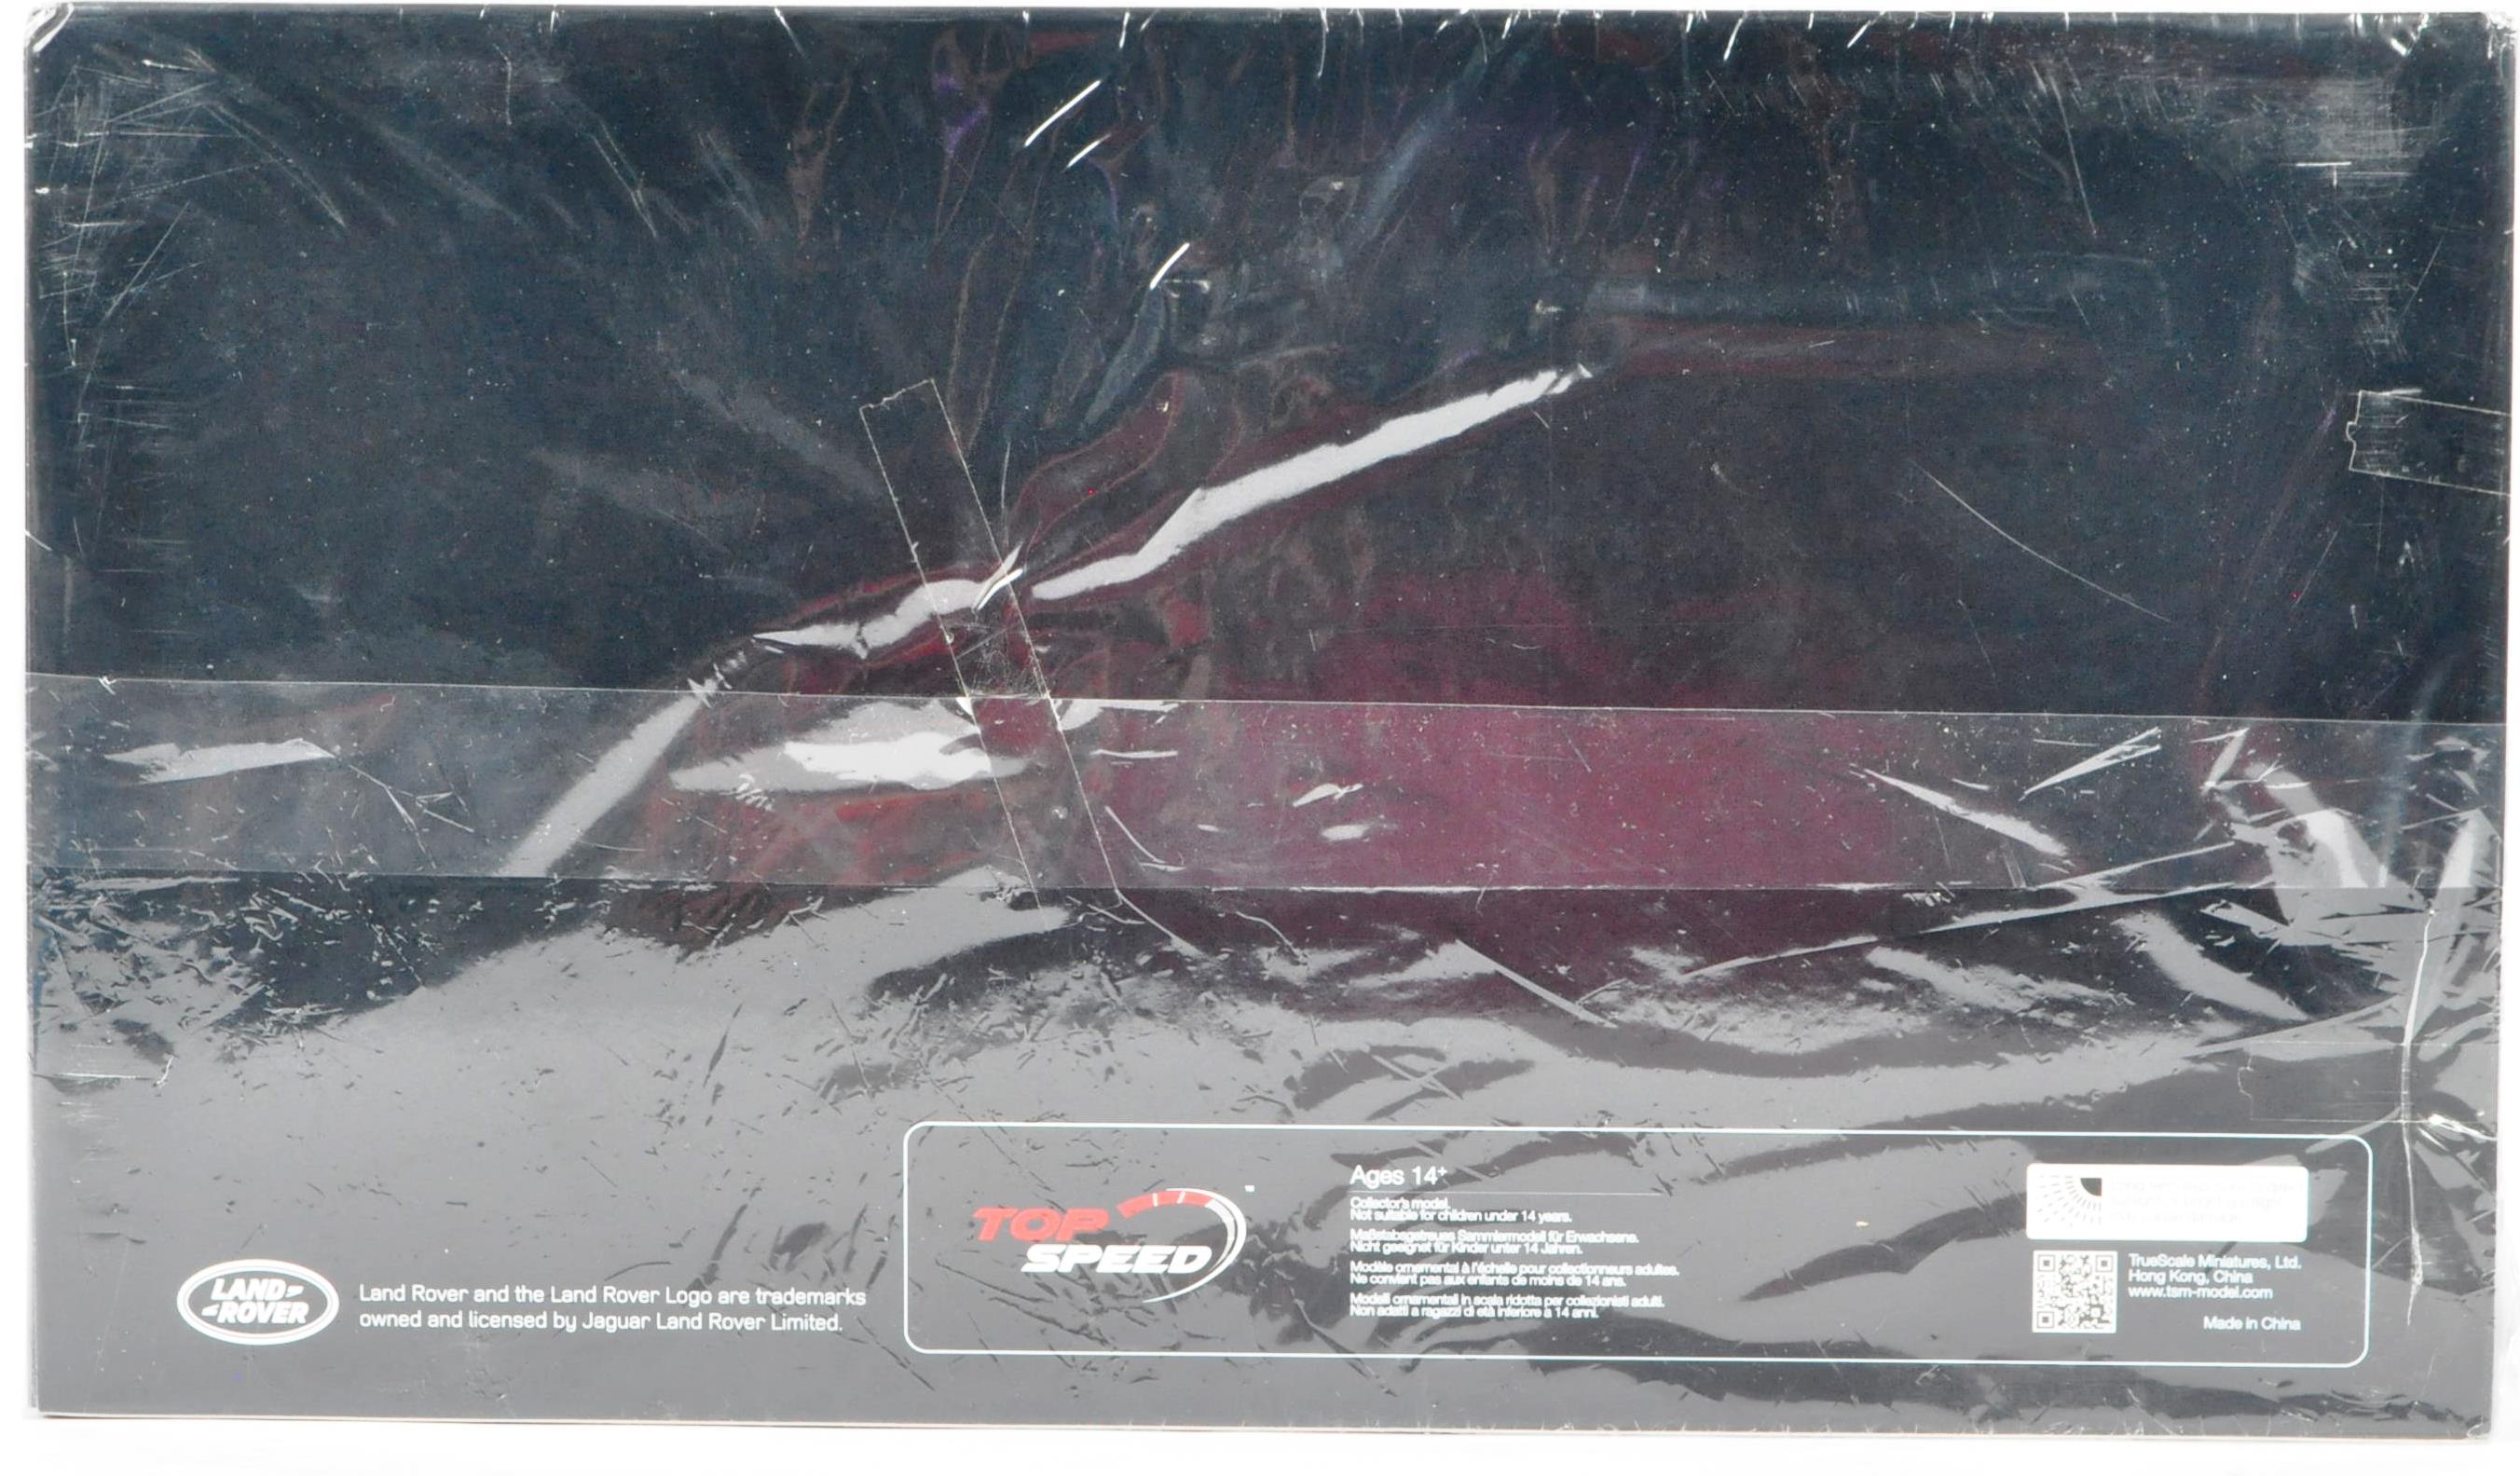 TRUE SCALE MINATURES 1/18 SCALE RANGE ROVER EVOKE CONVERTIBLE DIECAST MODEL - Image 2 of 6